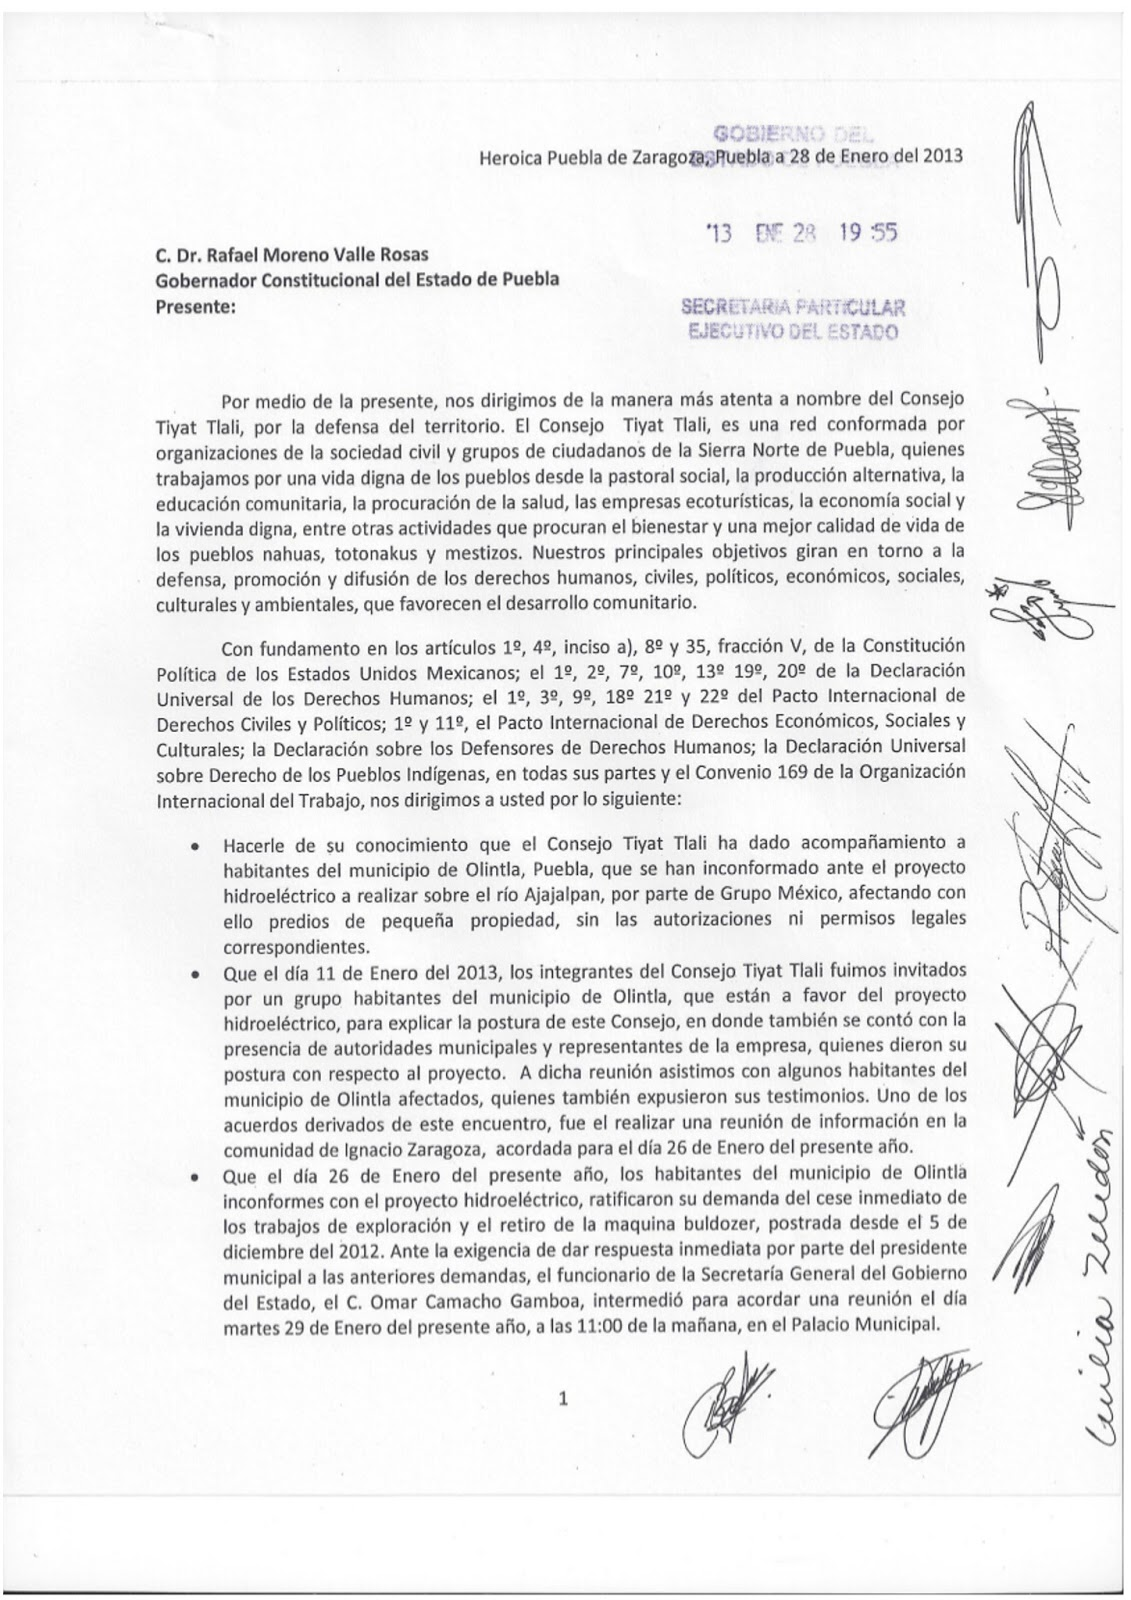 http://estudiosecumenicos.org.mx/wp-content/uploads/2013/01/Oficio-al-gob-del-estado.pdf